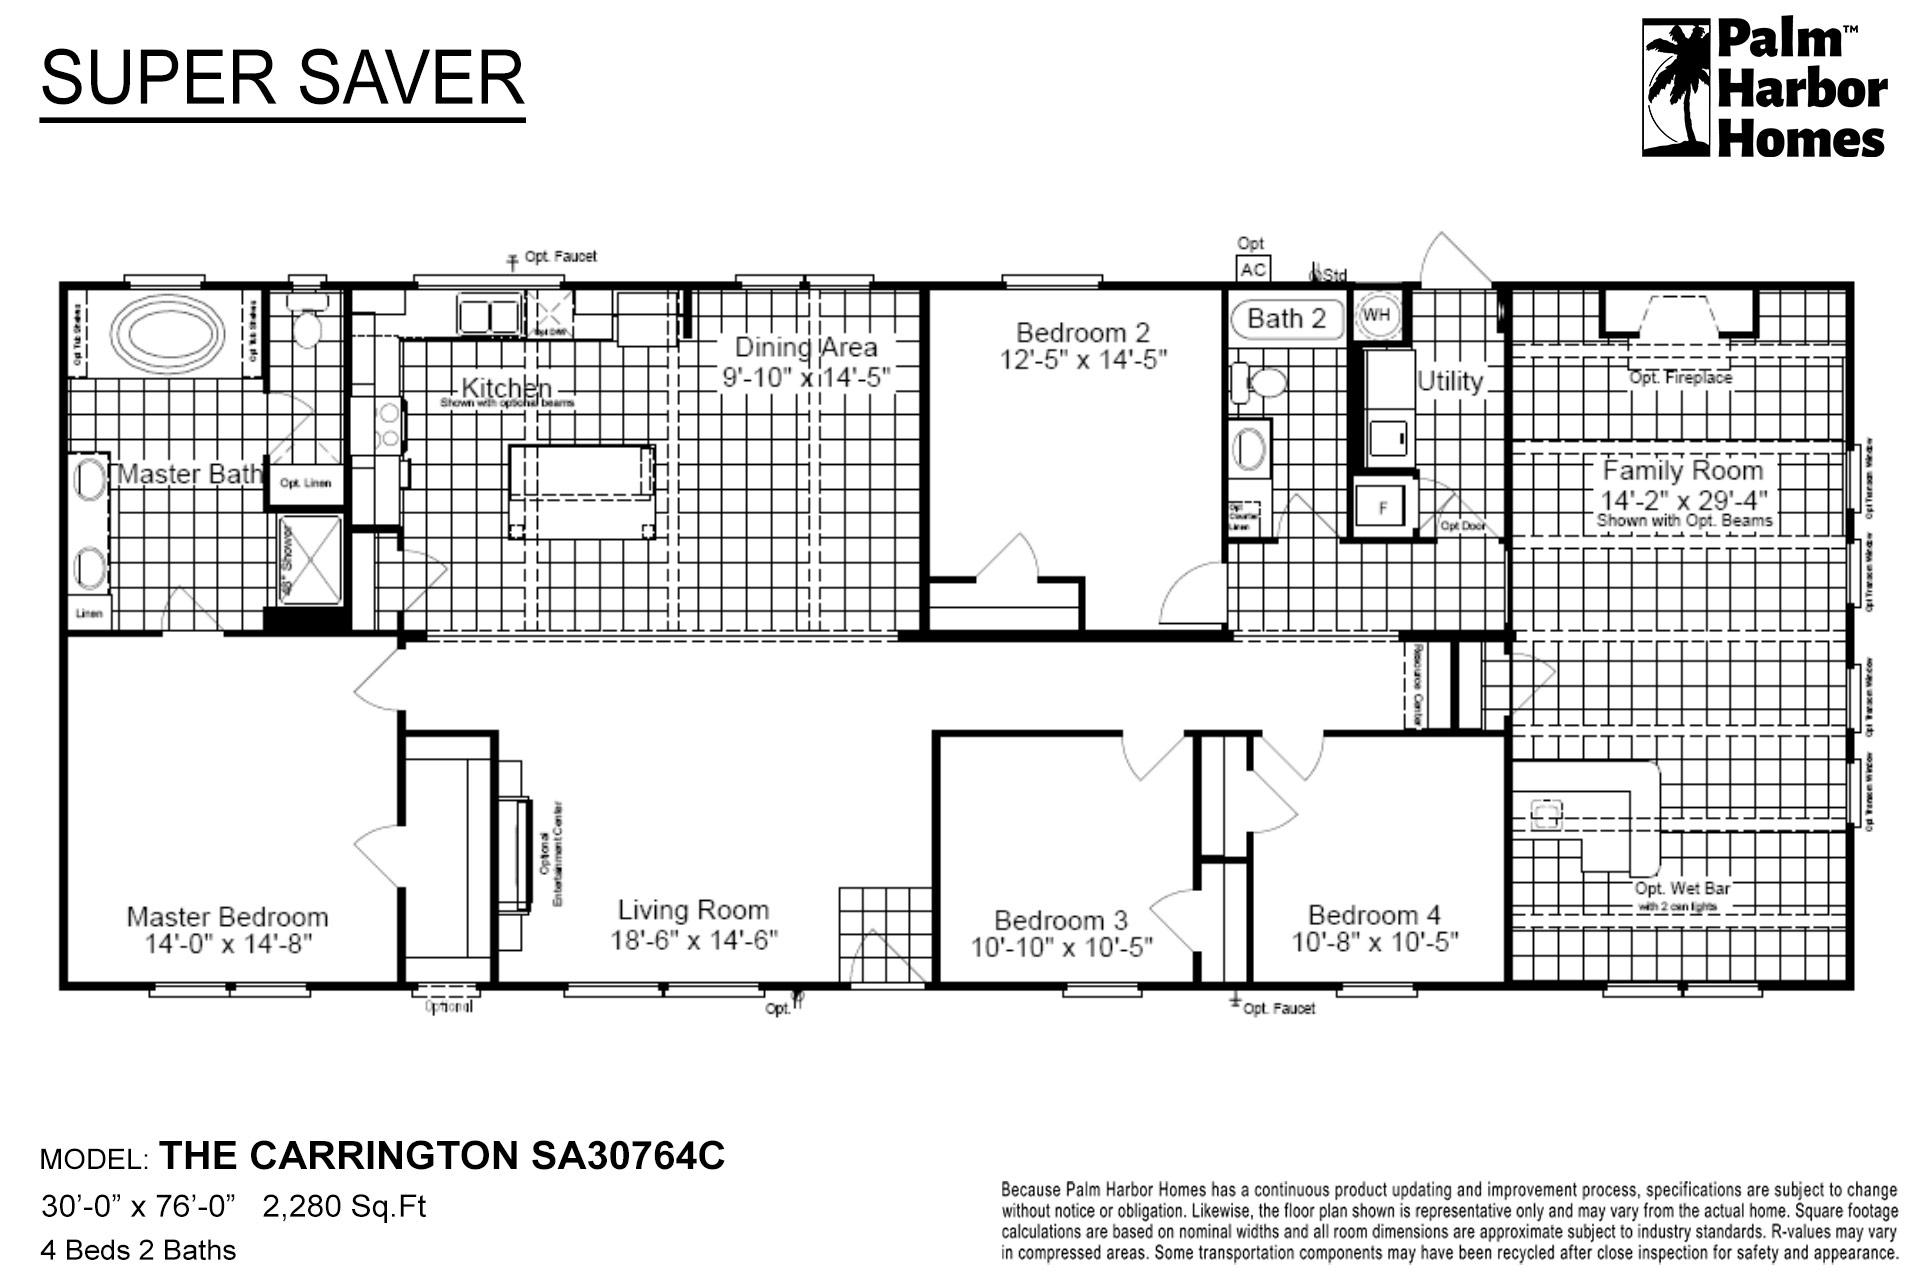 Super Saver The Carrington SA30764C Layout